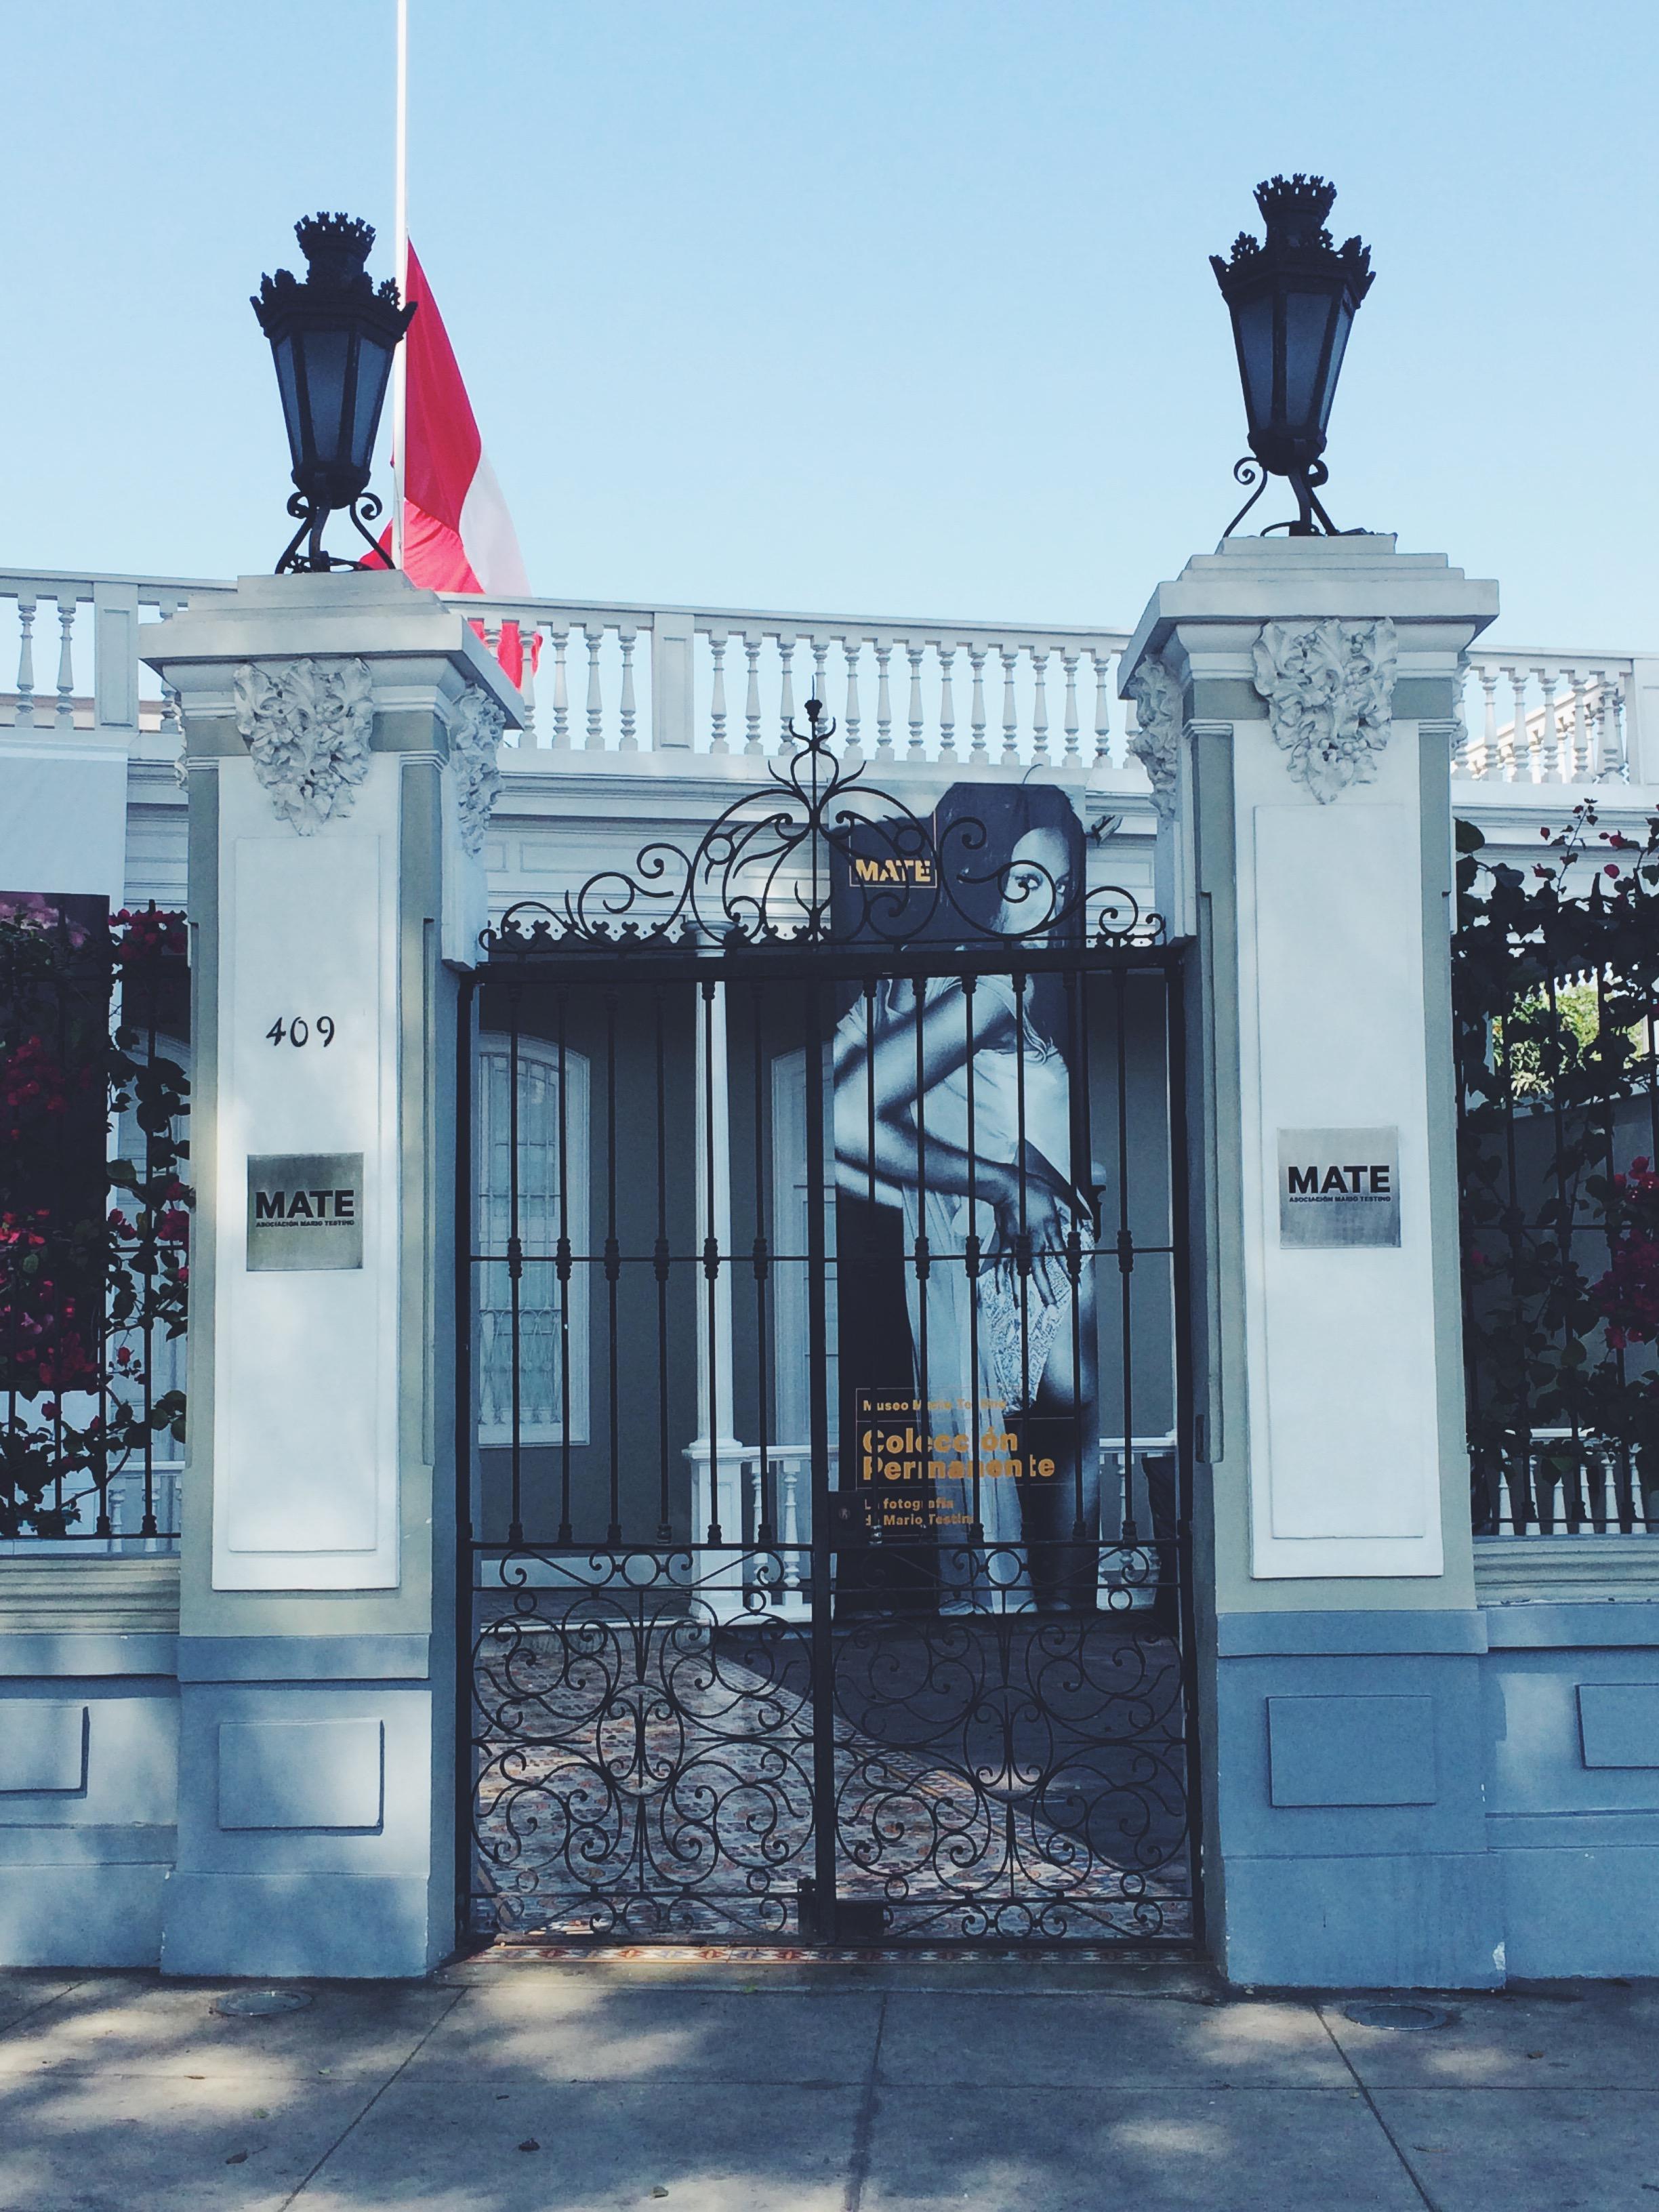 MARIO TESTINO MUSEUM, BARRANCO